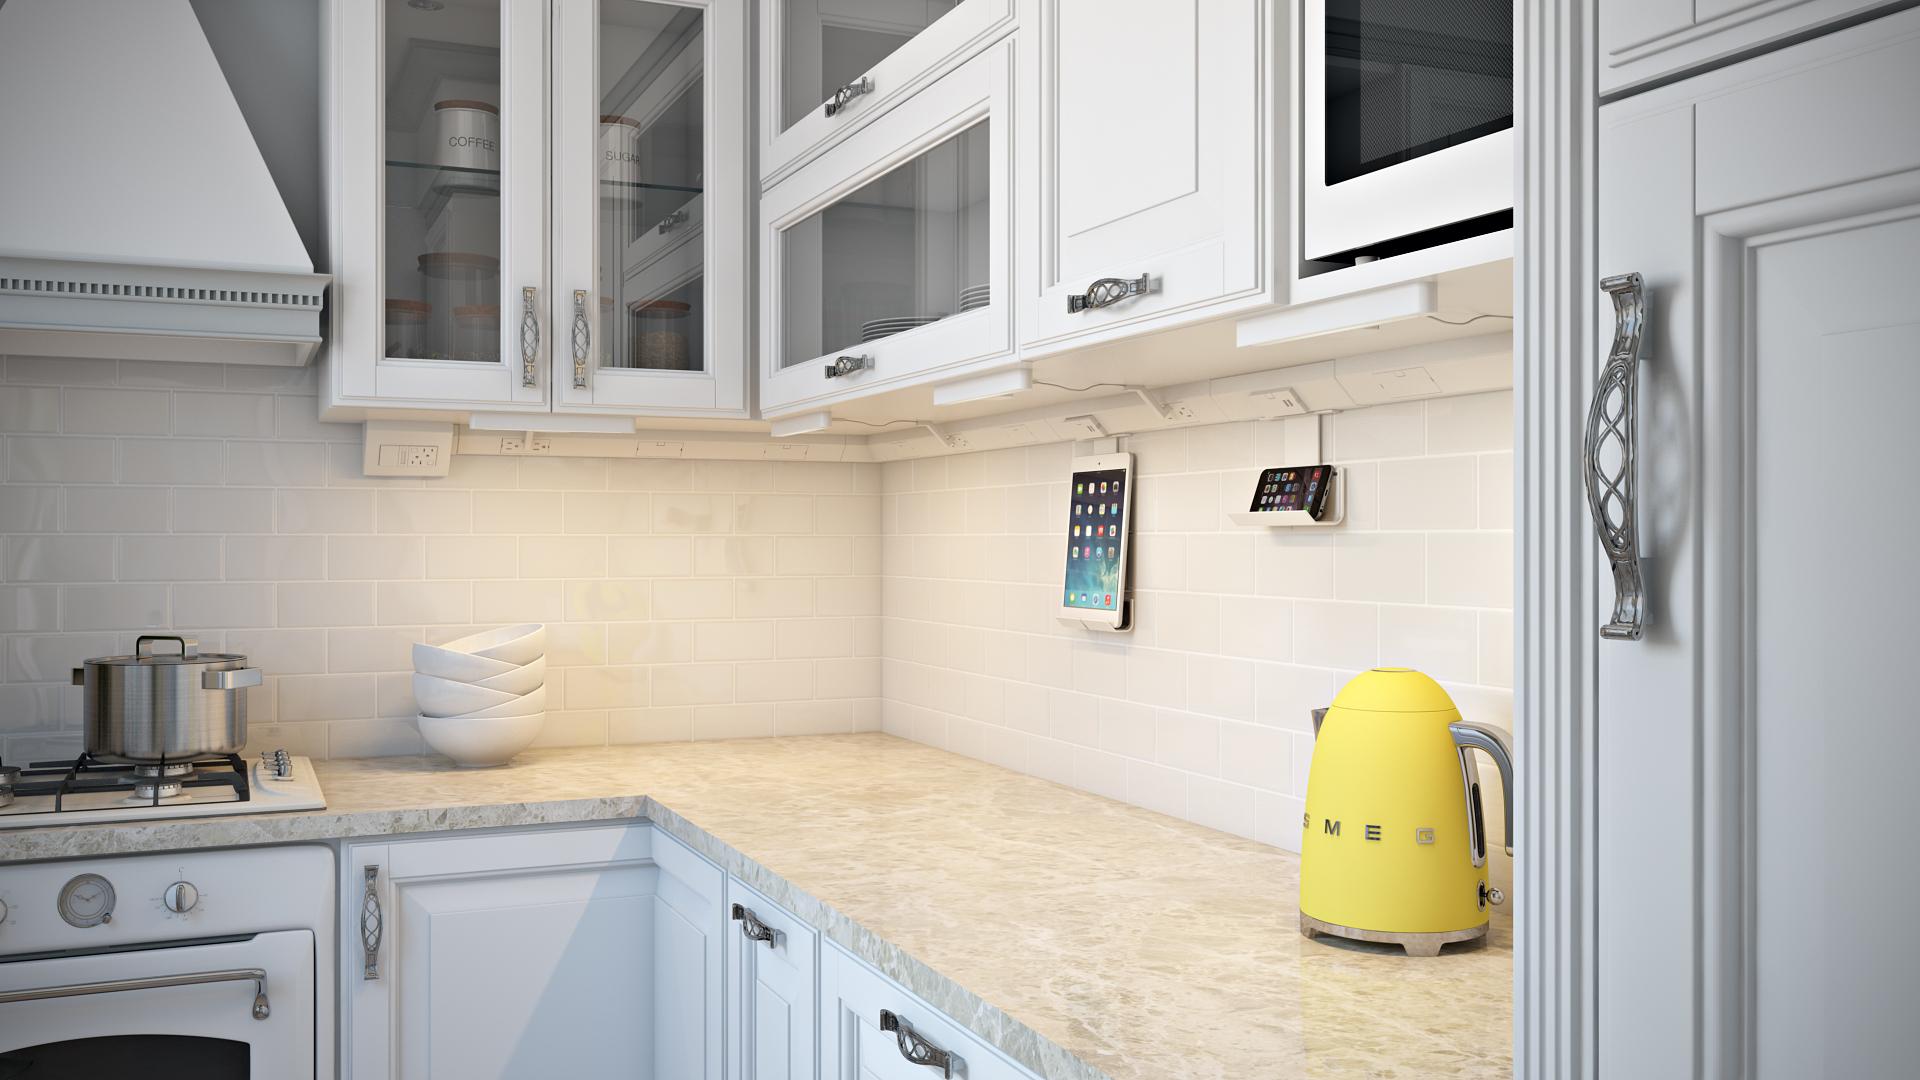 Under-Cabinet Lighting System | For Residential Pros